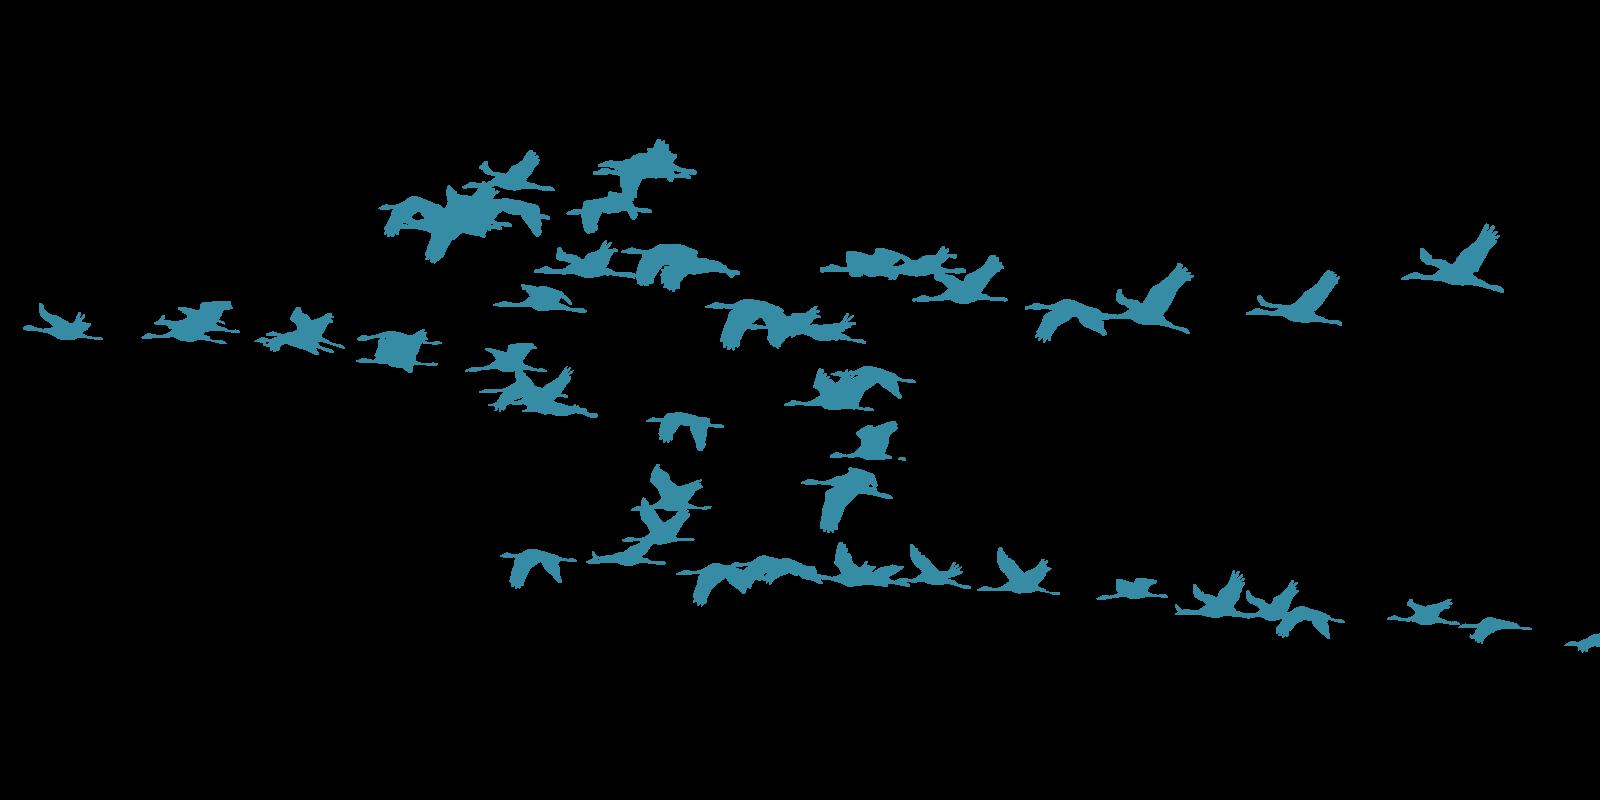 Blue Flock of Birds